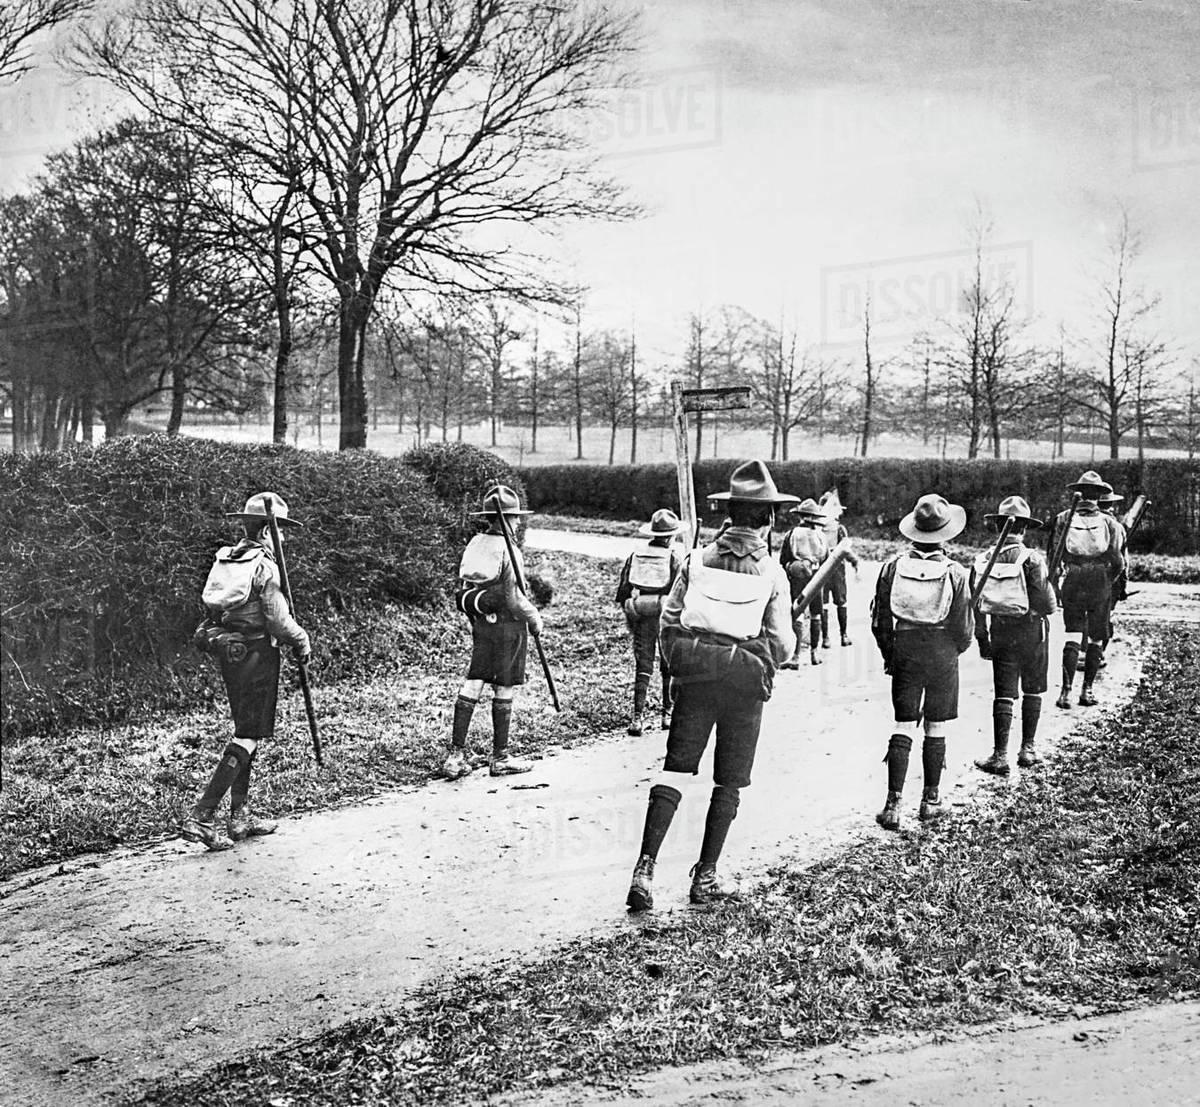 Magic lantern slide circa 1900 Victorian Social History Boy scouts trekking  along a path stock photo